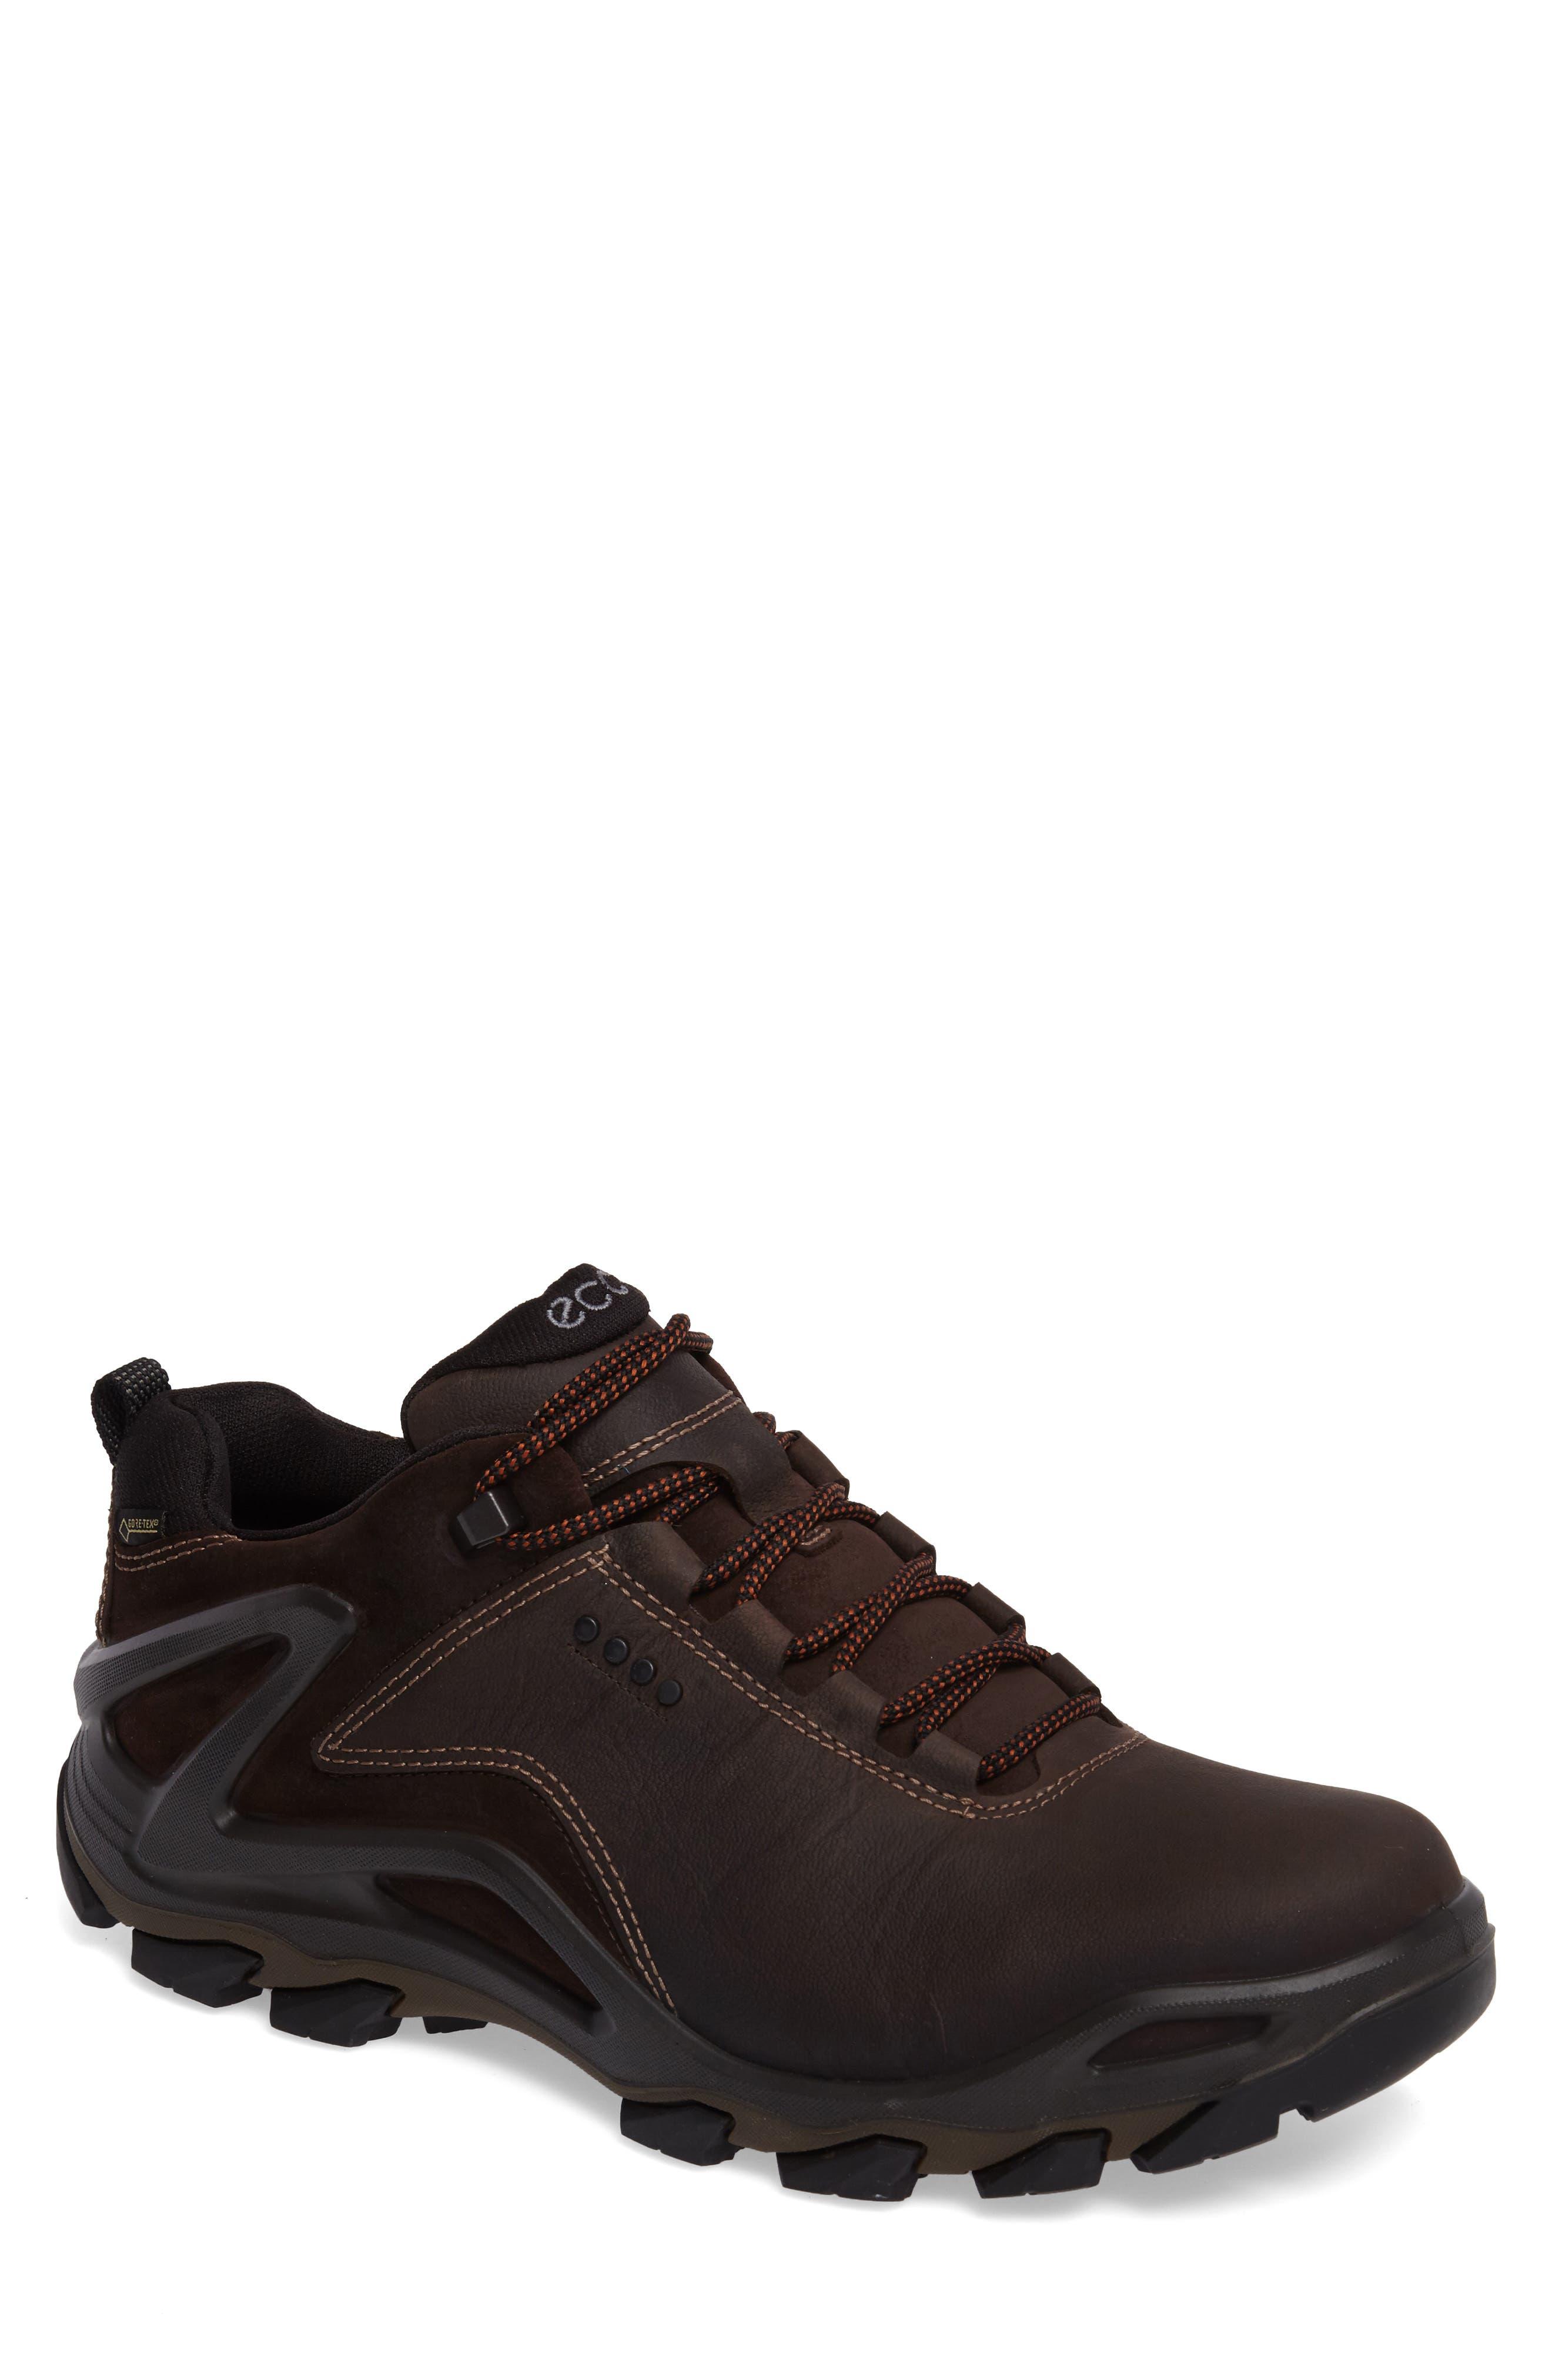 Terra Evo GTX Low Hiking Shoe,                             Main thumbnail 1, color,                             BLACK NUBUCK/ SUEDE